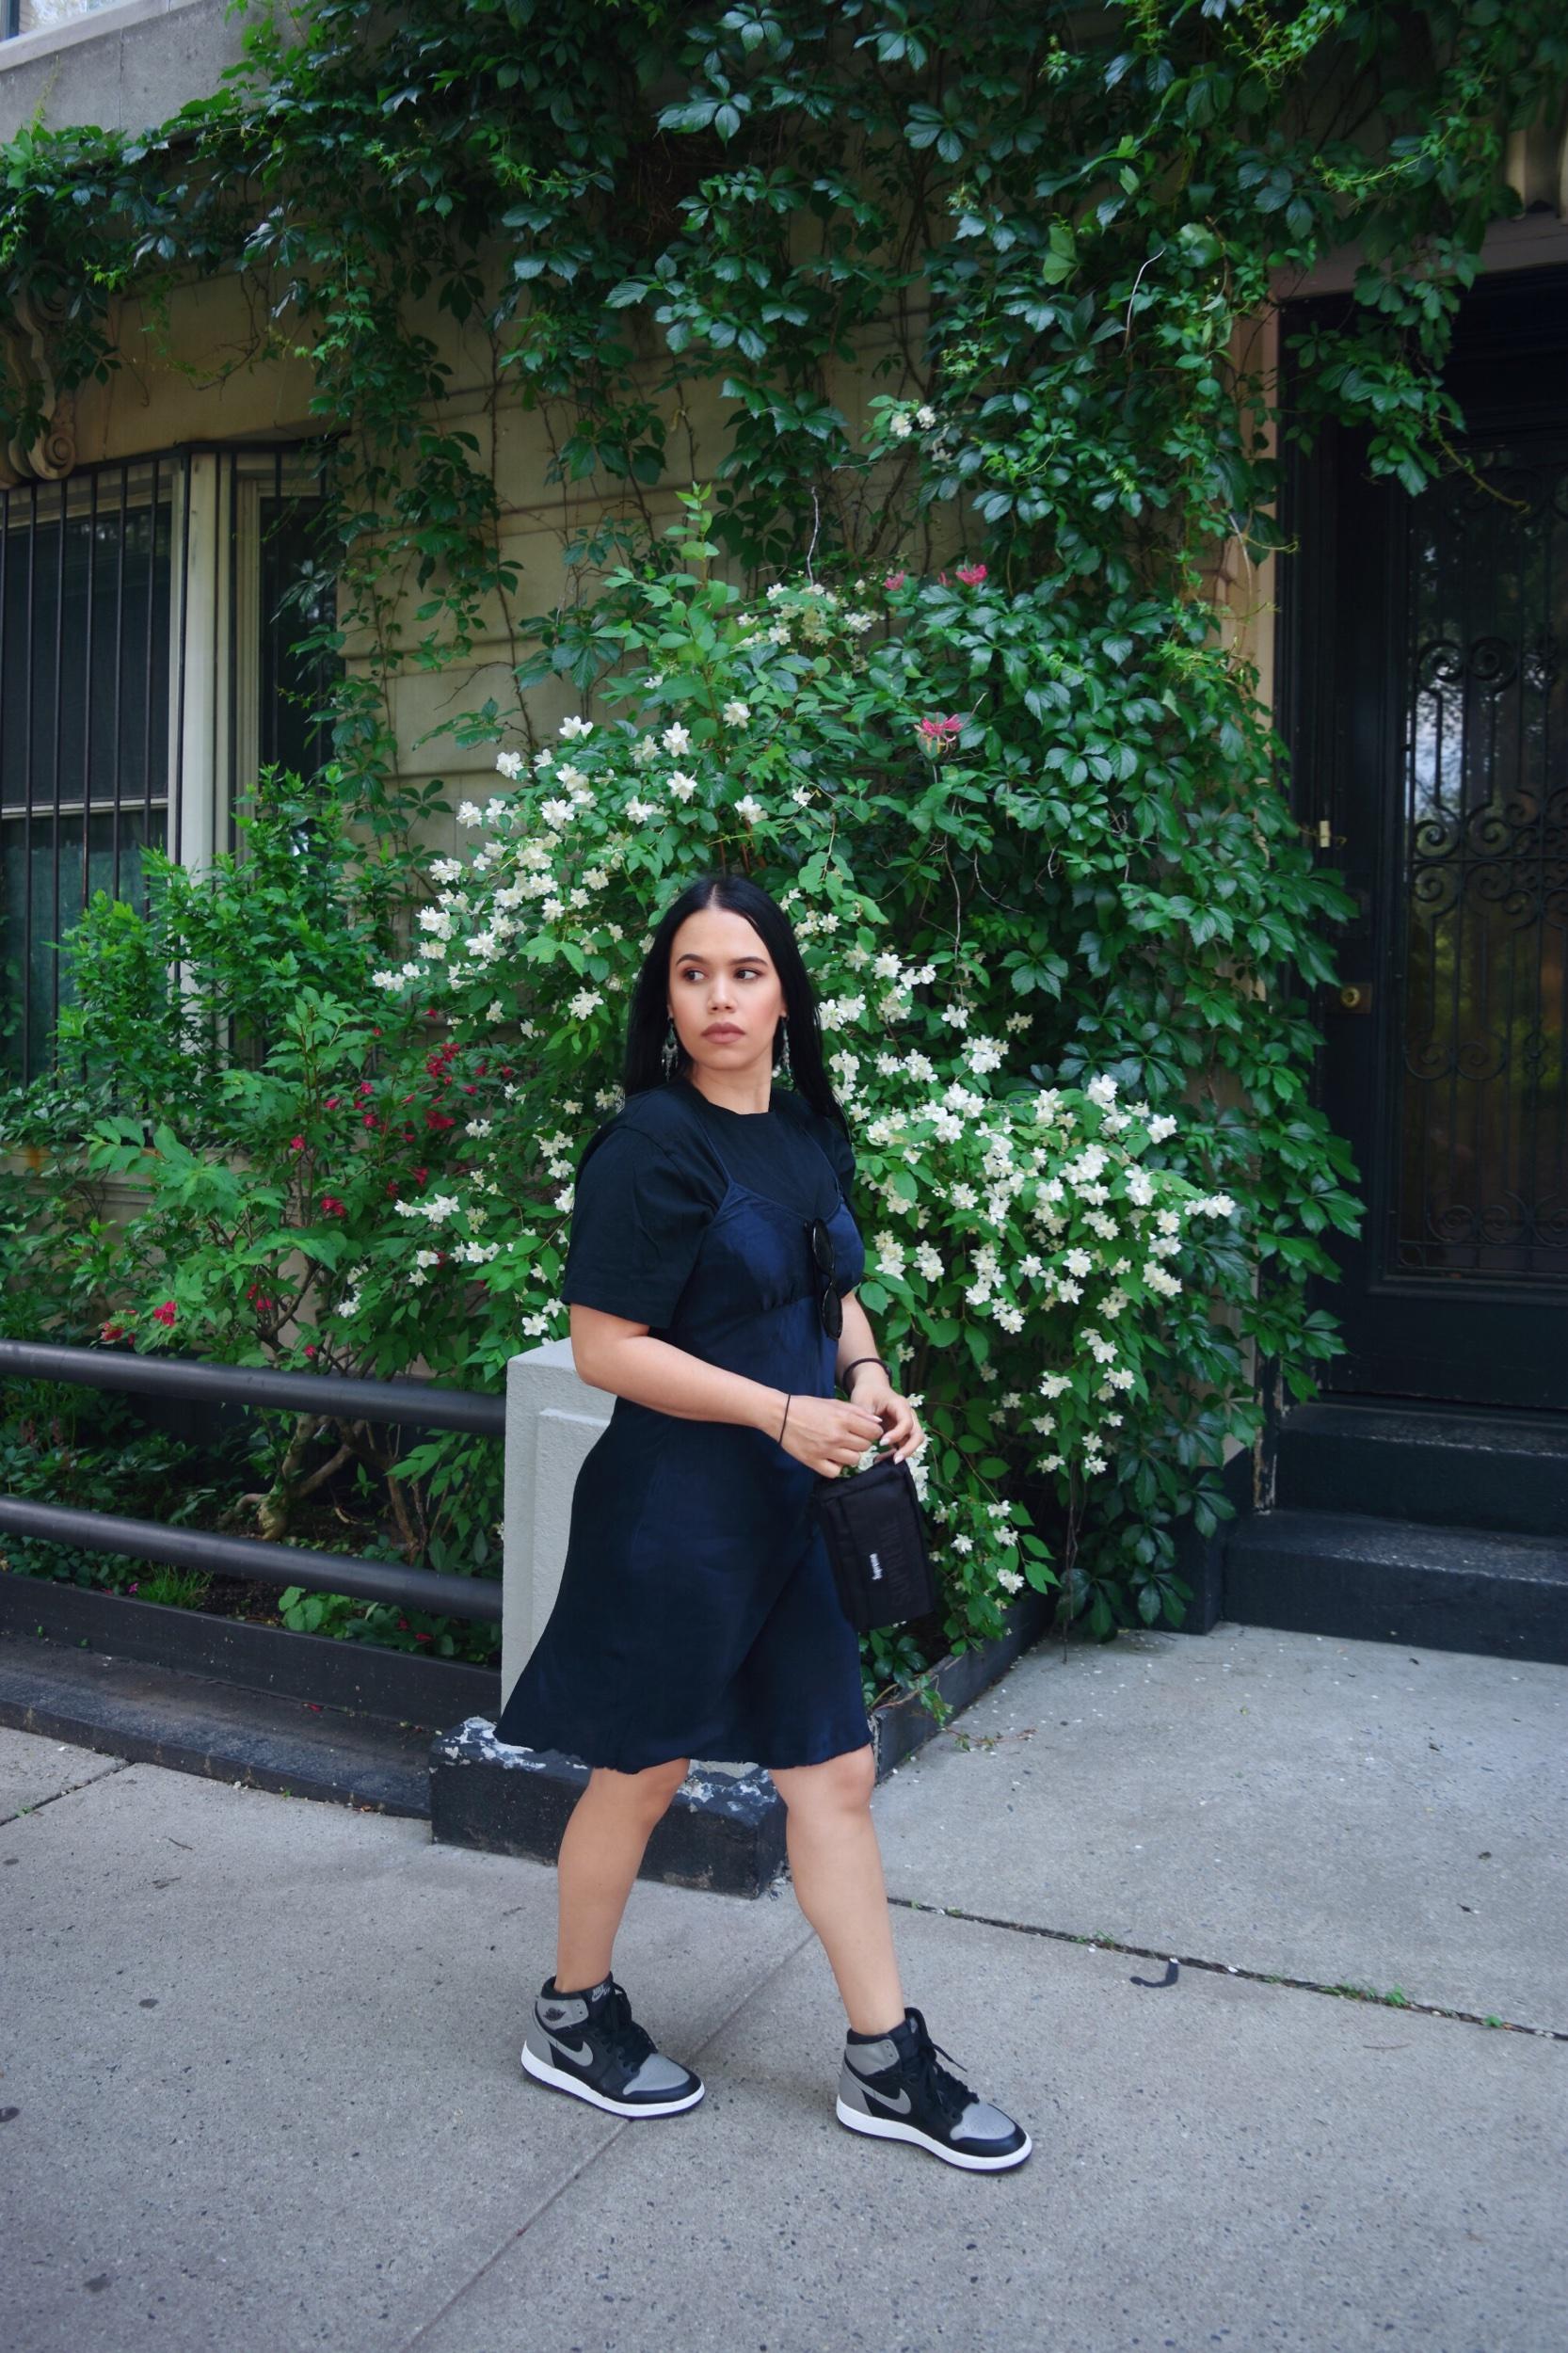 Silk Dress: Club Monaco   Zara T-shirt   Supreme Pouch   Nike Air Jordan 1 Shadows